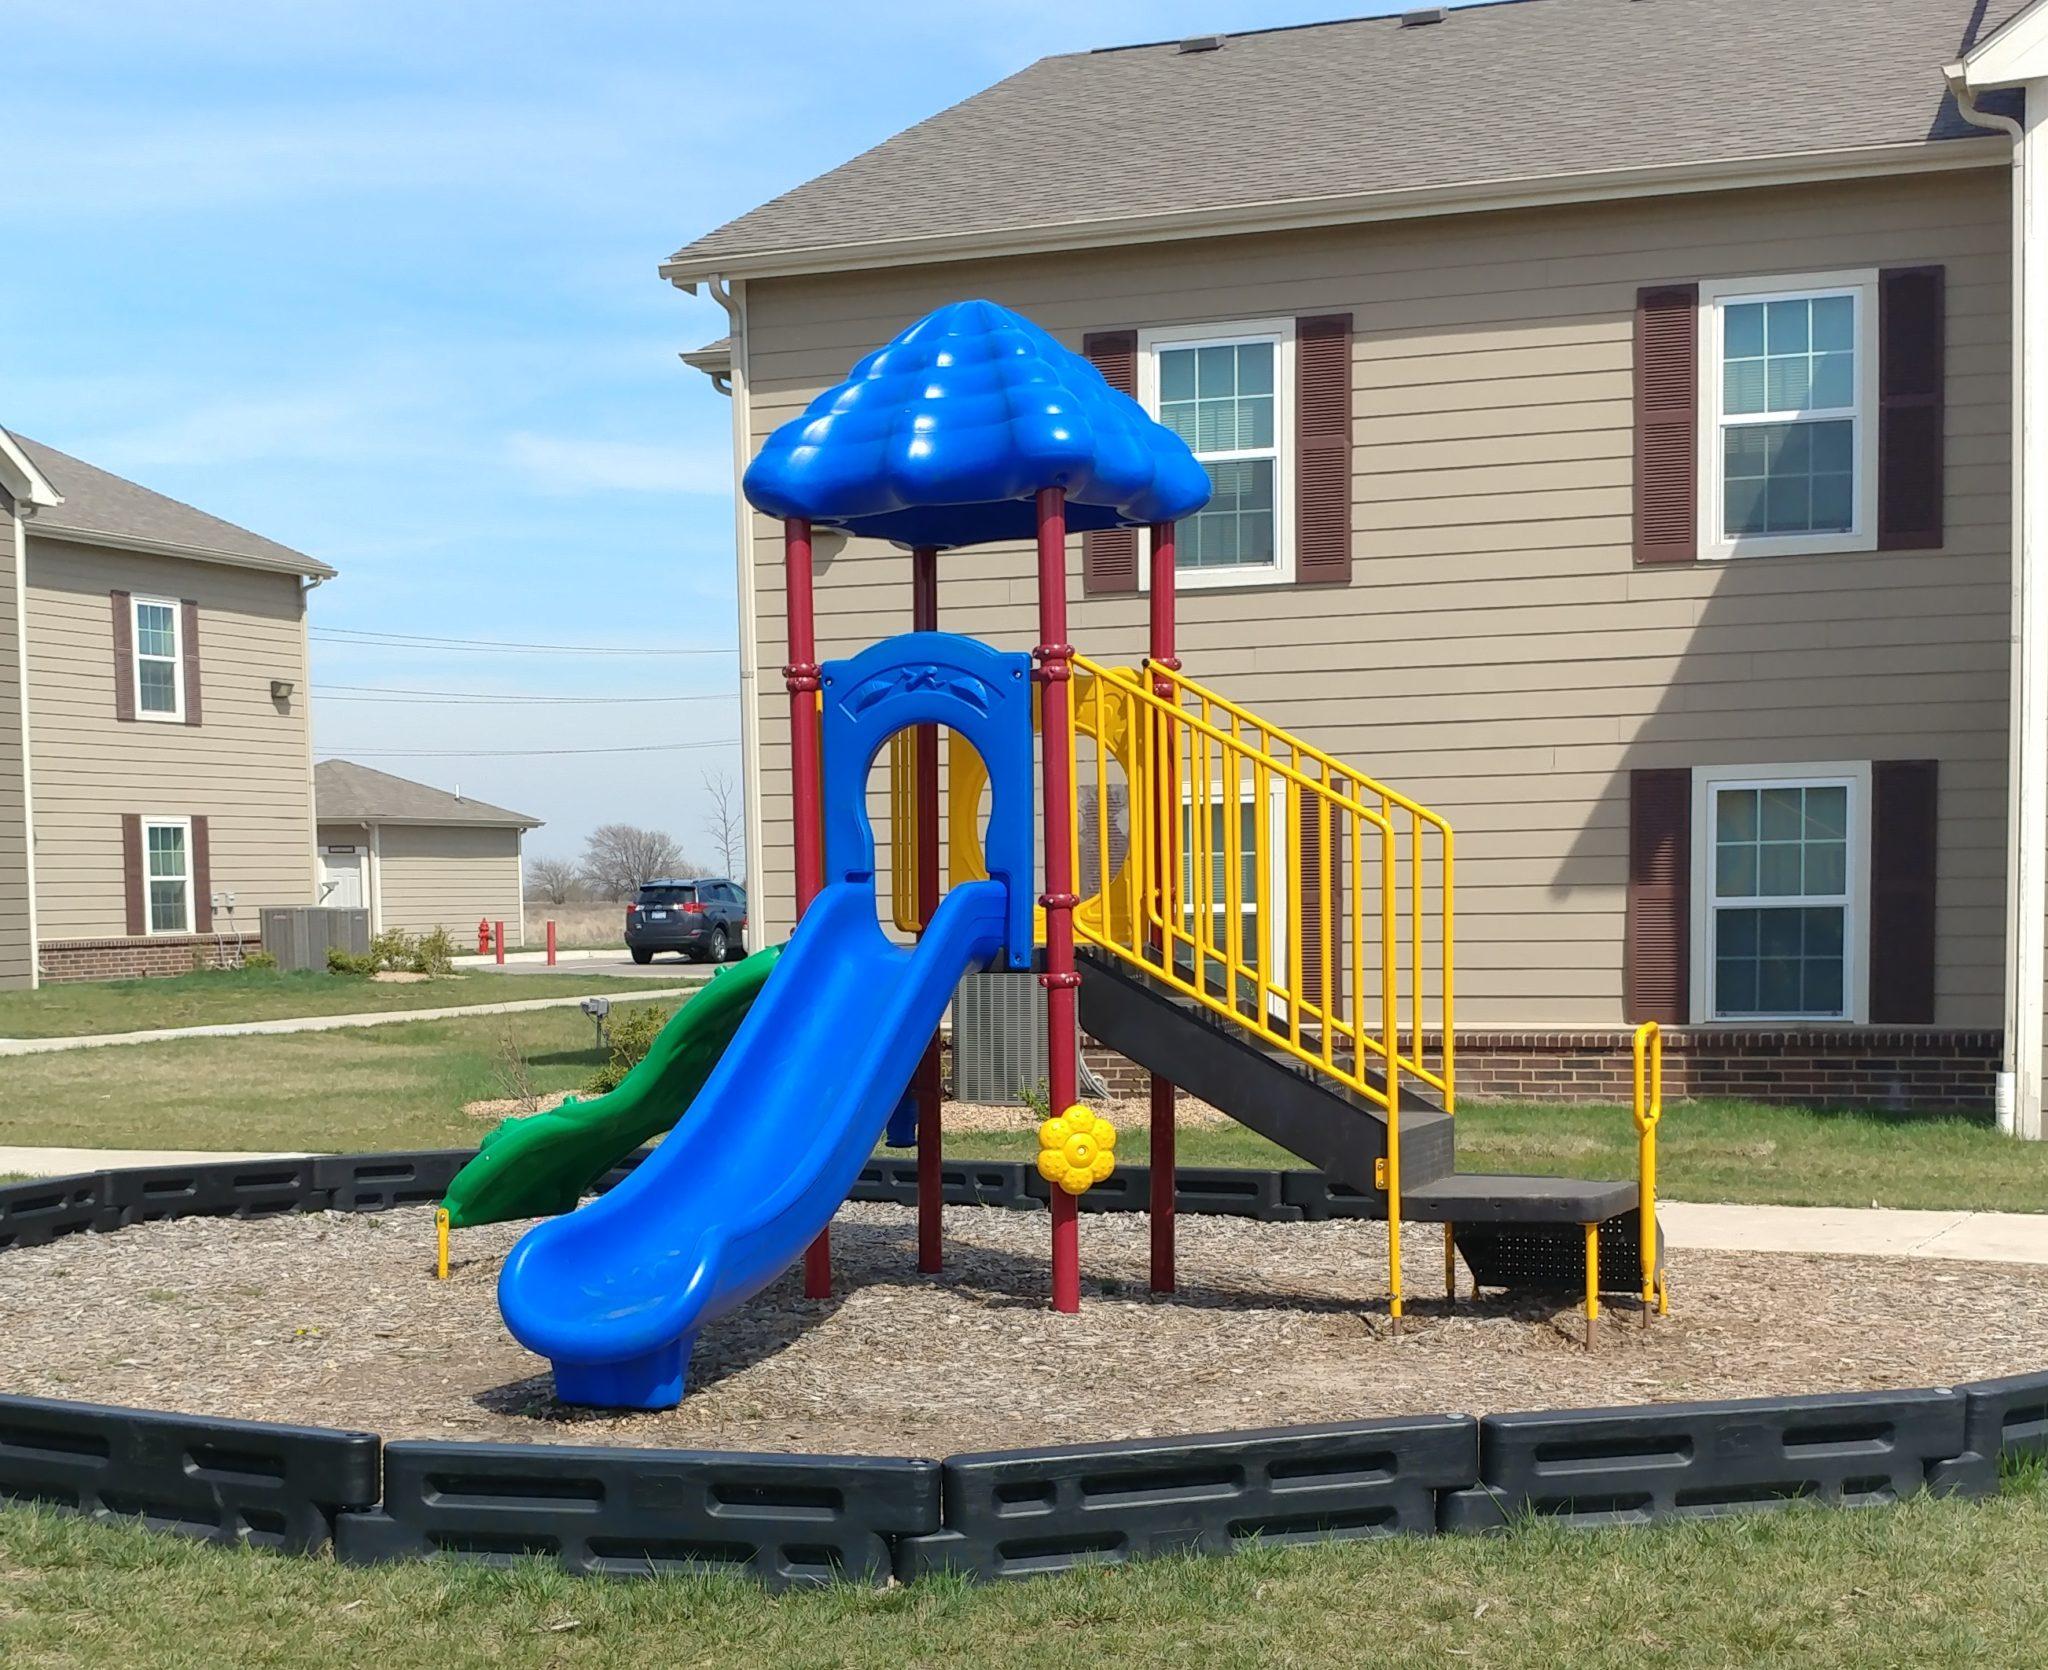 Broadstone Villas Bel Aire Kansas playground 2